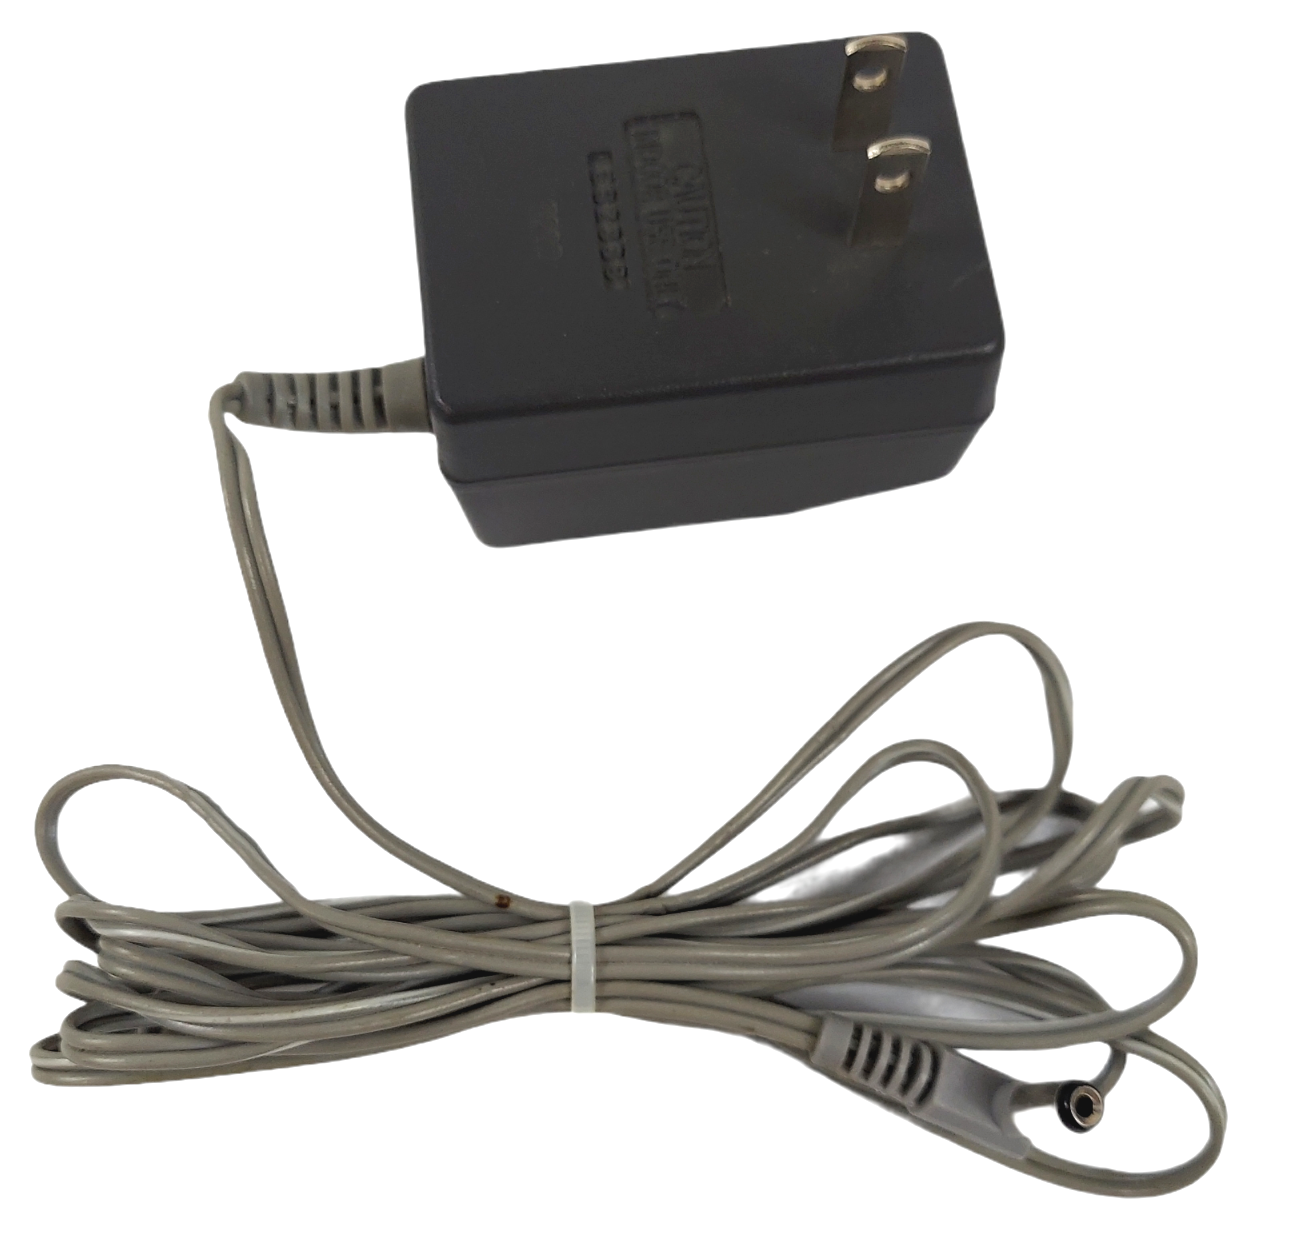 Panasonic AC Power Supply Adapter Model KX-A10 - Free Shipping! - $8.90